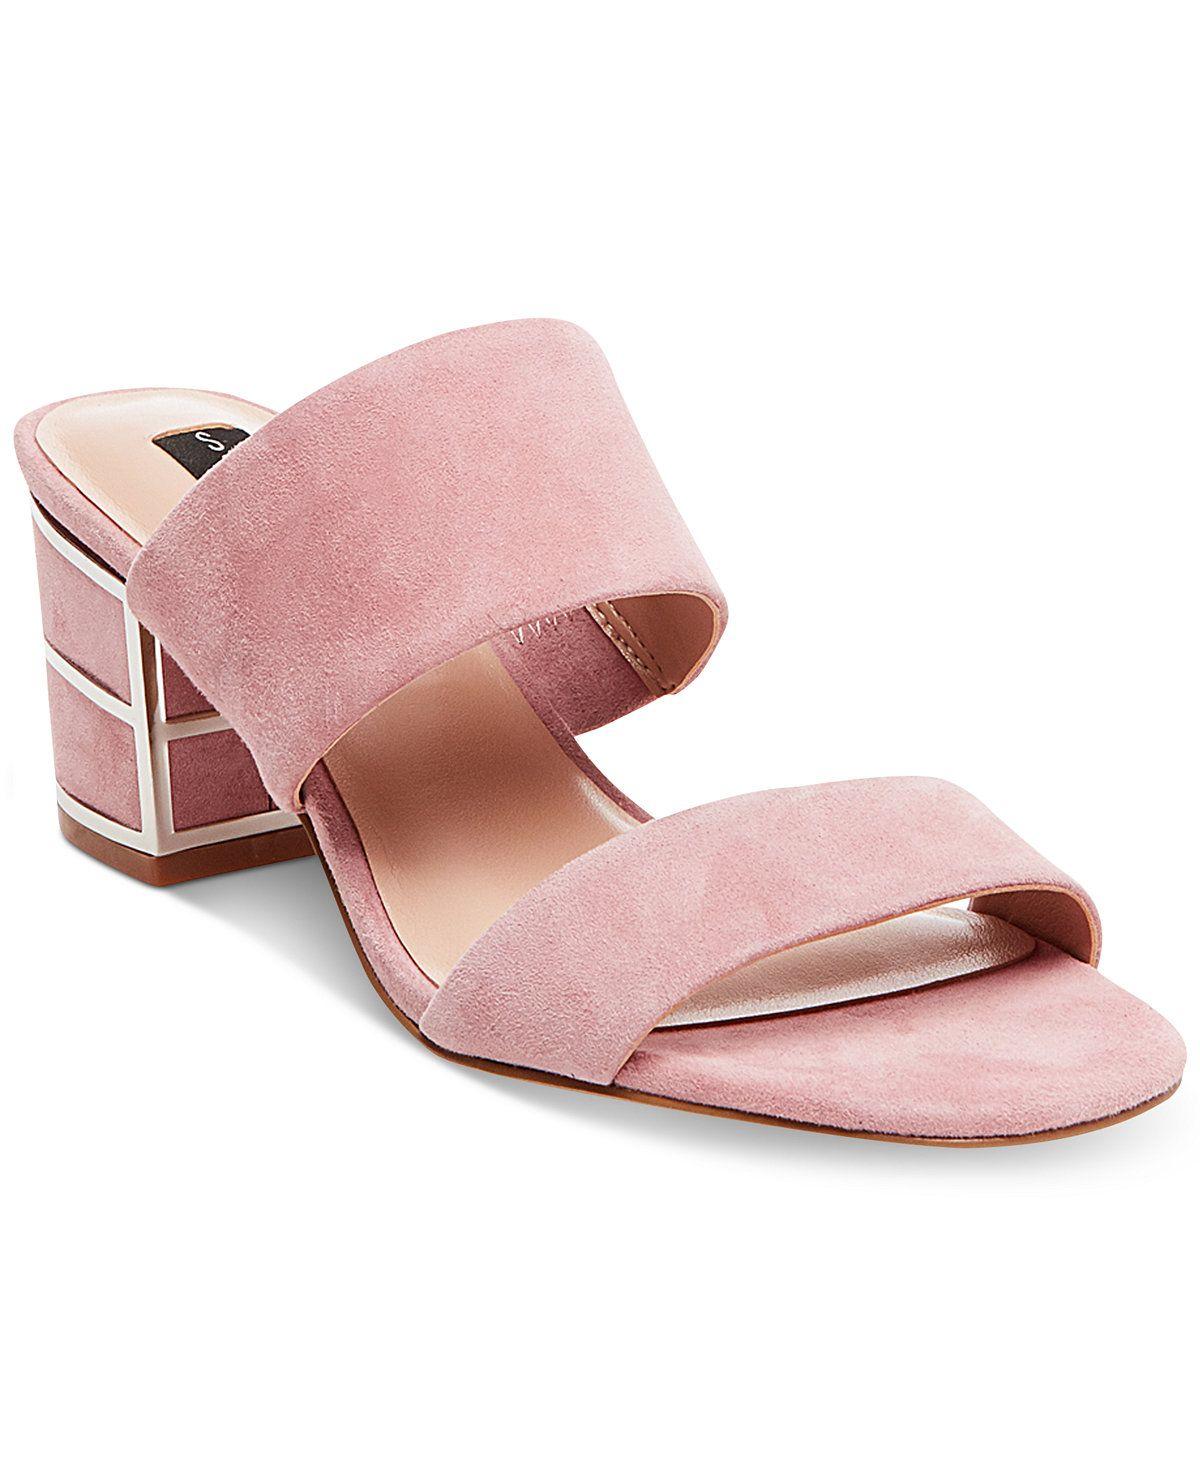 27cf402f6639 STEVEN By Steve Madden Women s Siggy Block-Heel Sandals - Sandals - Shoes -  Macy s